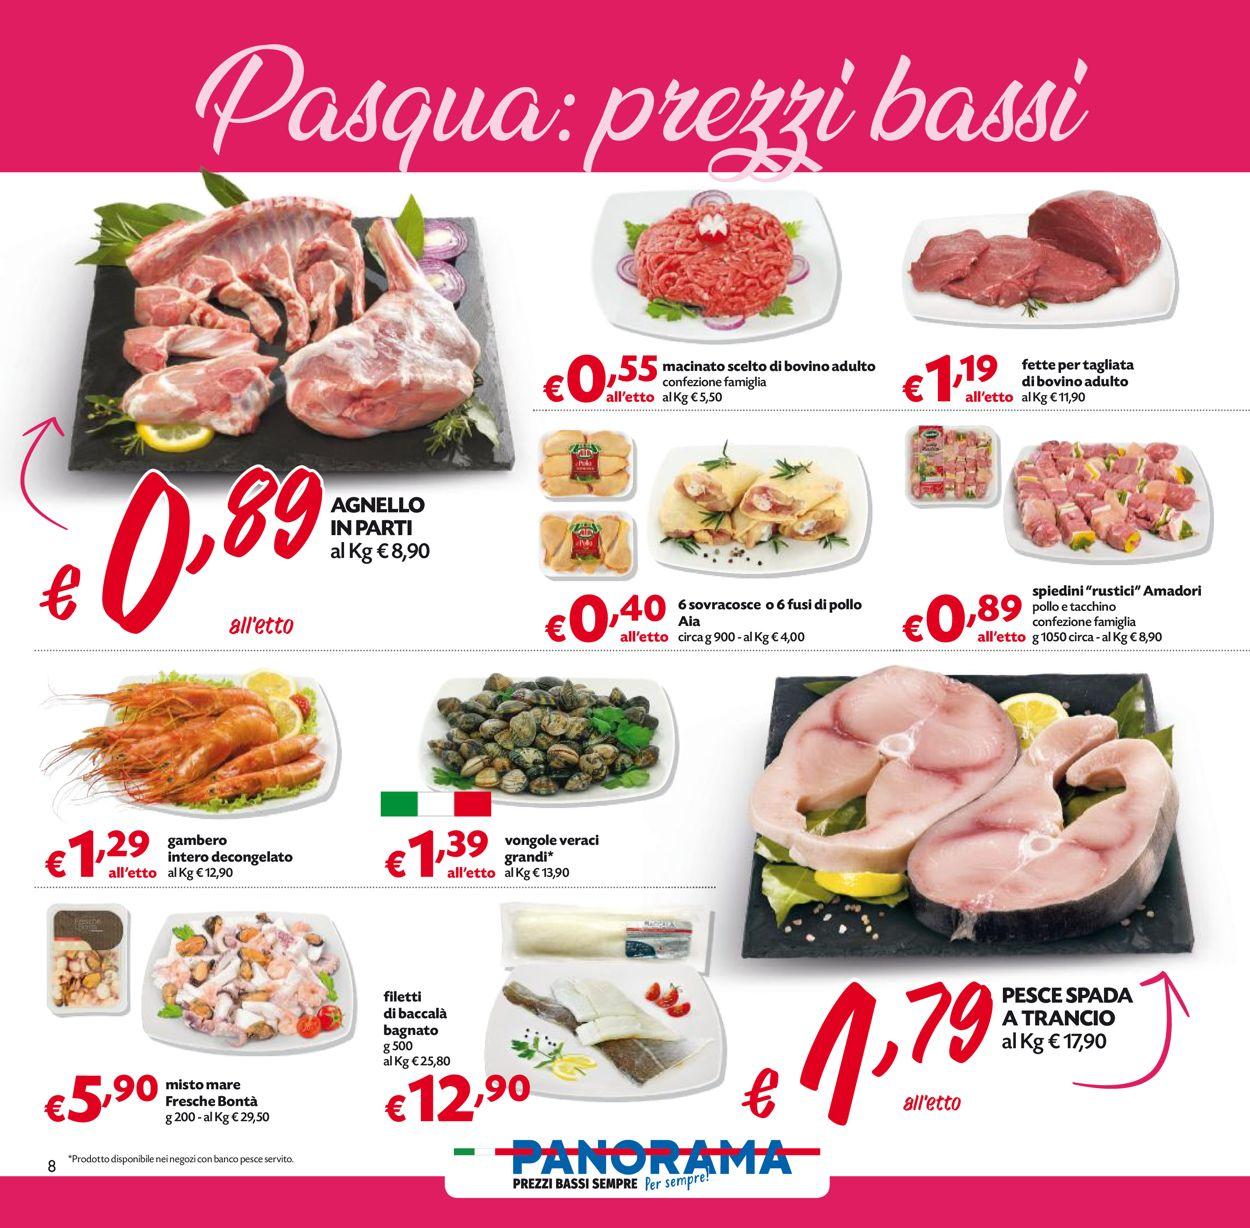 Volantino Pam Panorama - Pasqua 2021! - Offerte 22/03-05/04/2021 (Pagina 8)